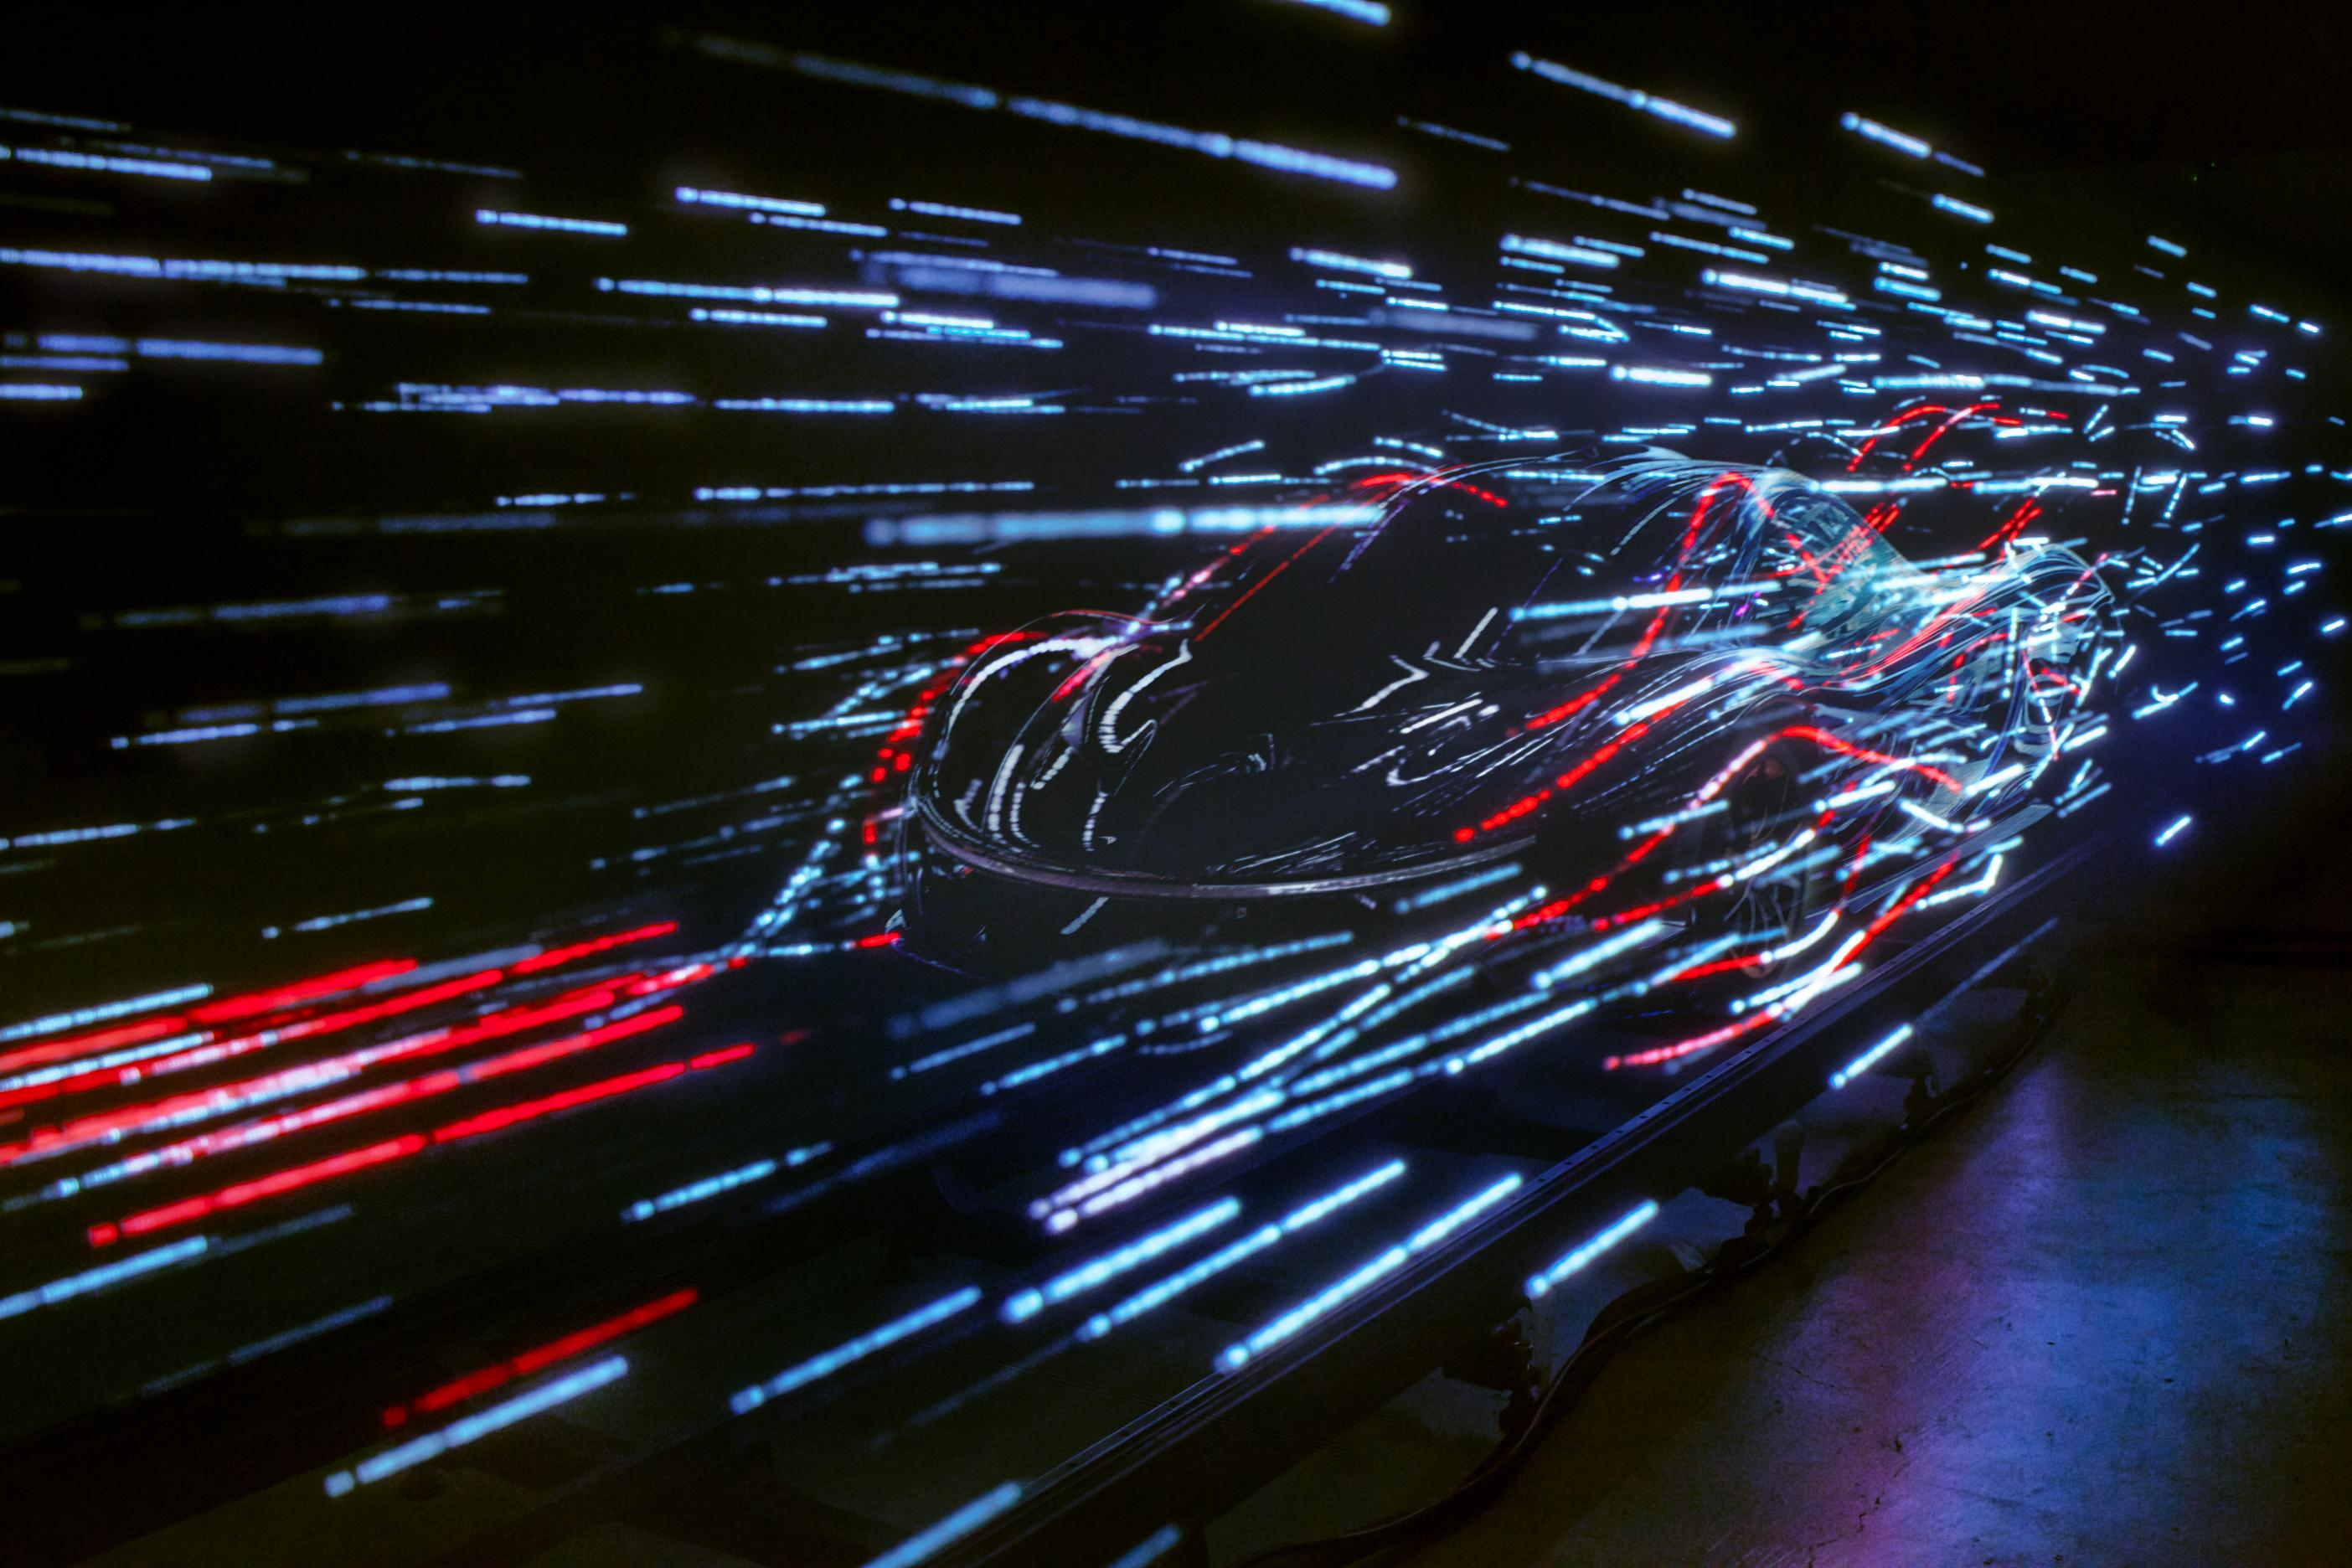 Mclaren P12 Hypercar Teased In New Aerodynamics Video